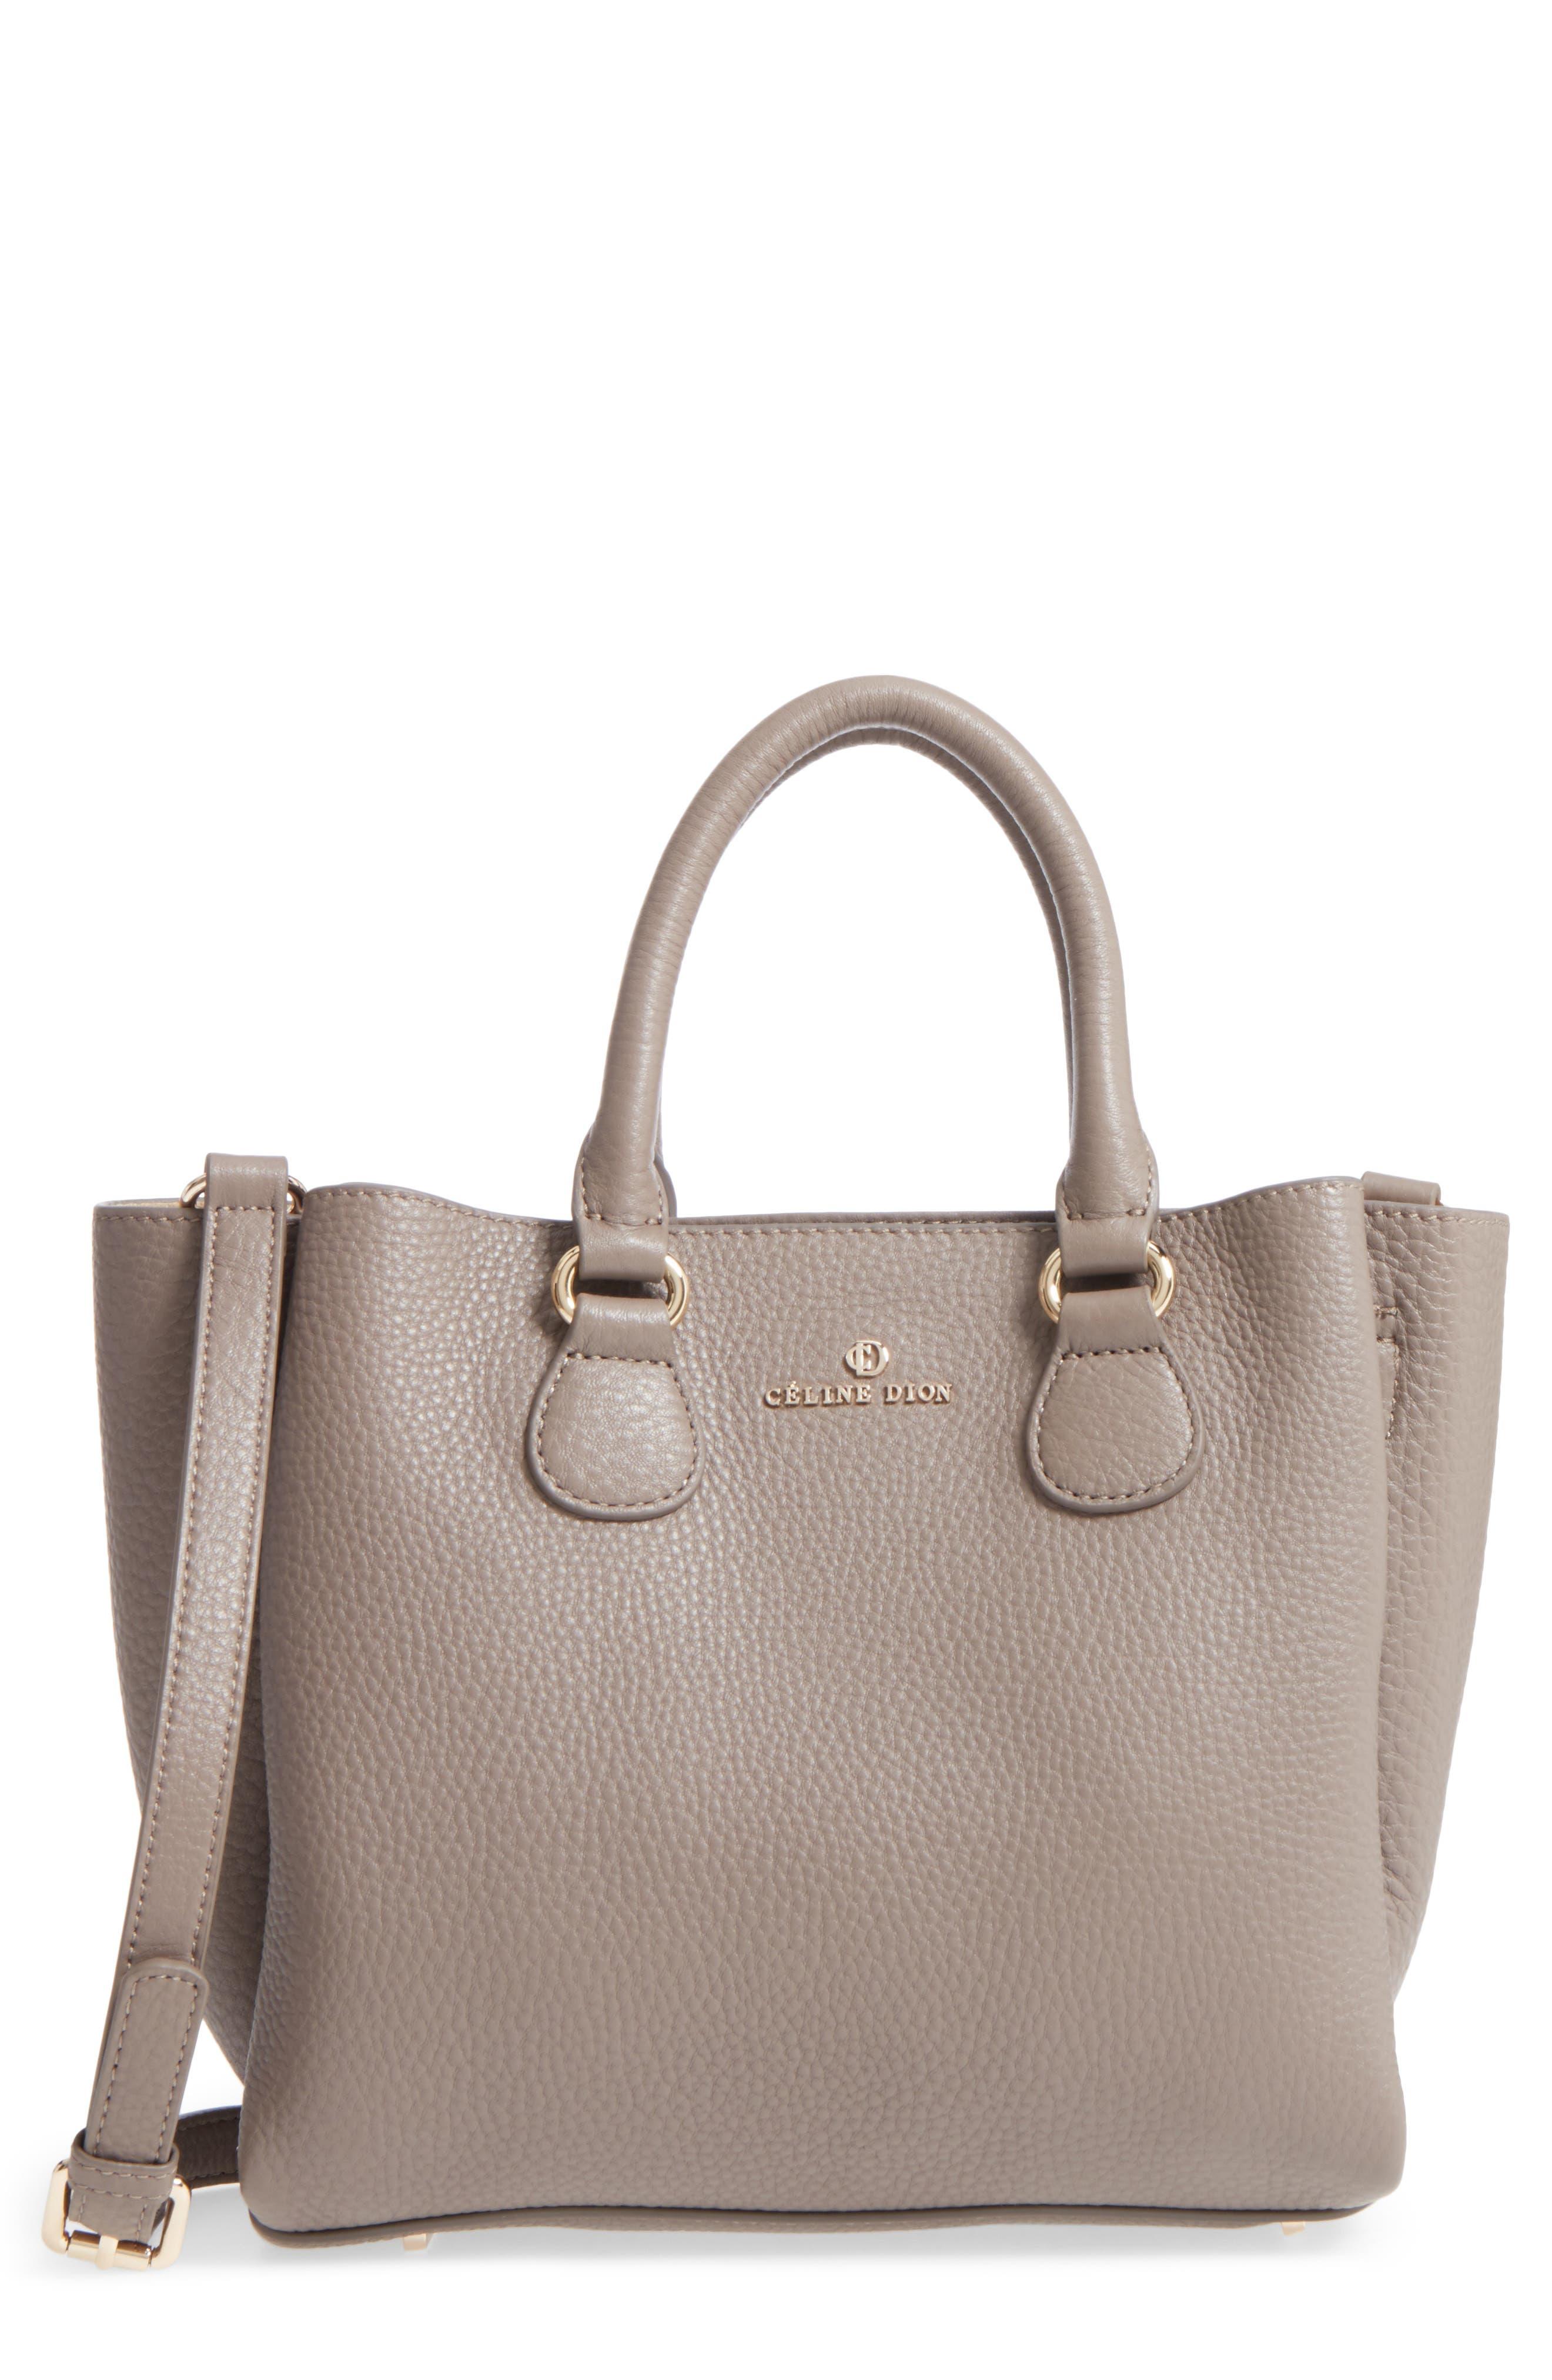 Céline Dion Small Adagio Leather Satchel,                         Main,                         color, Taupe